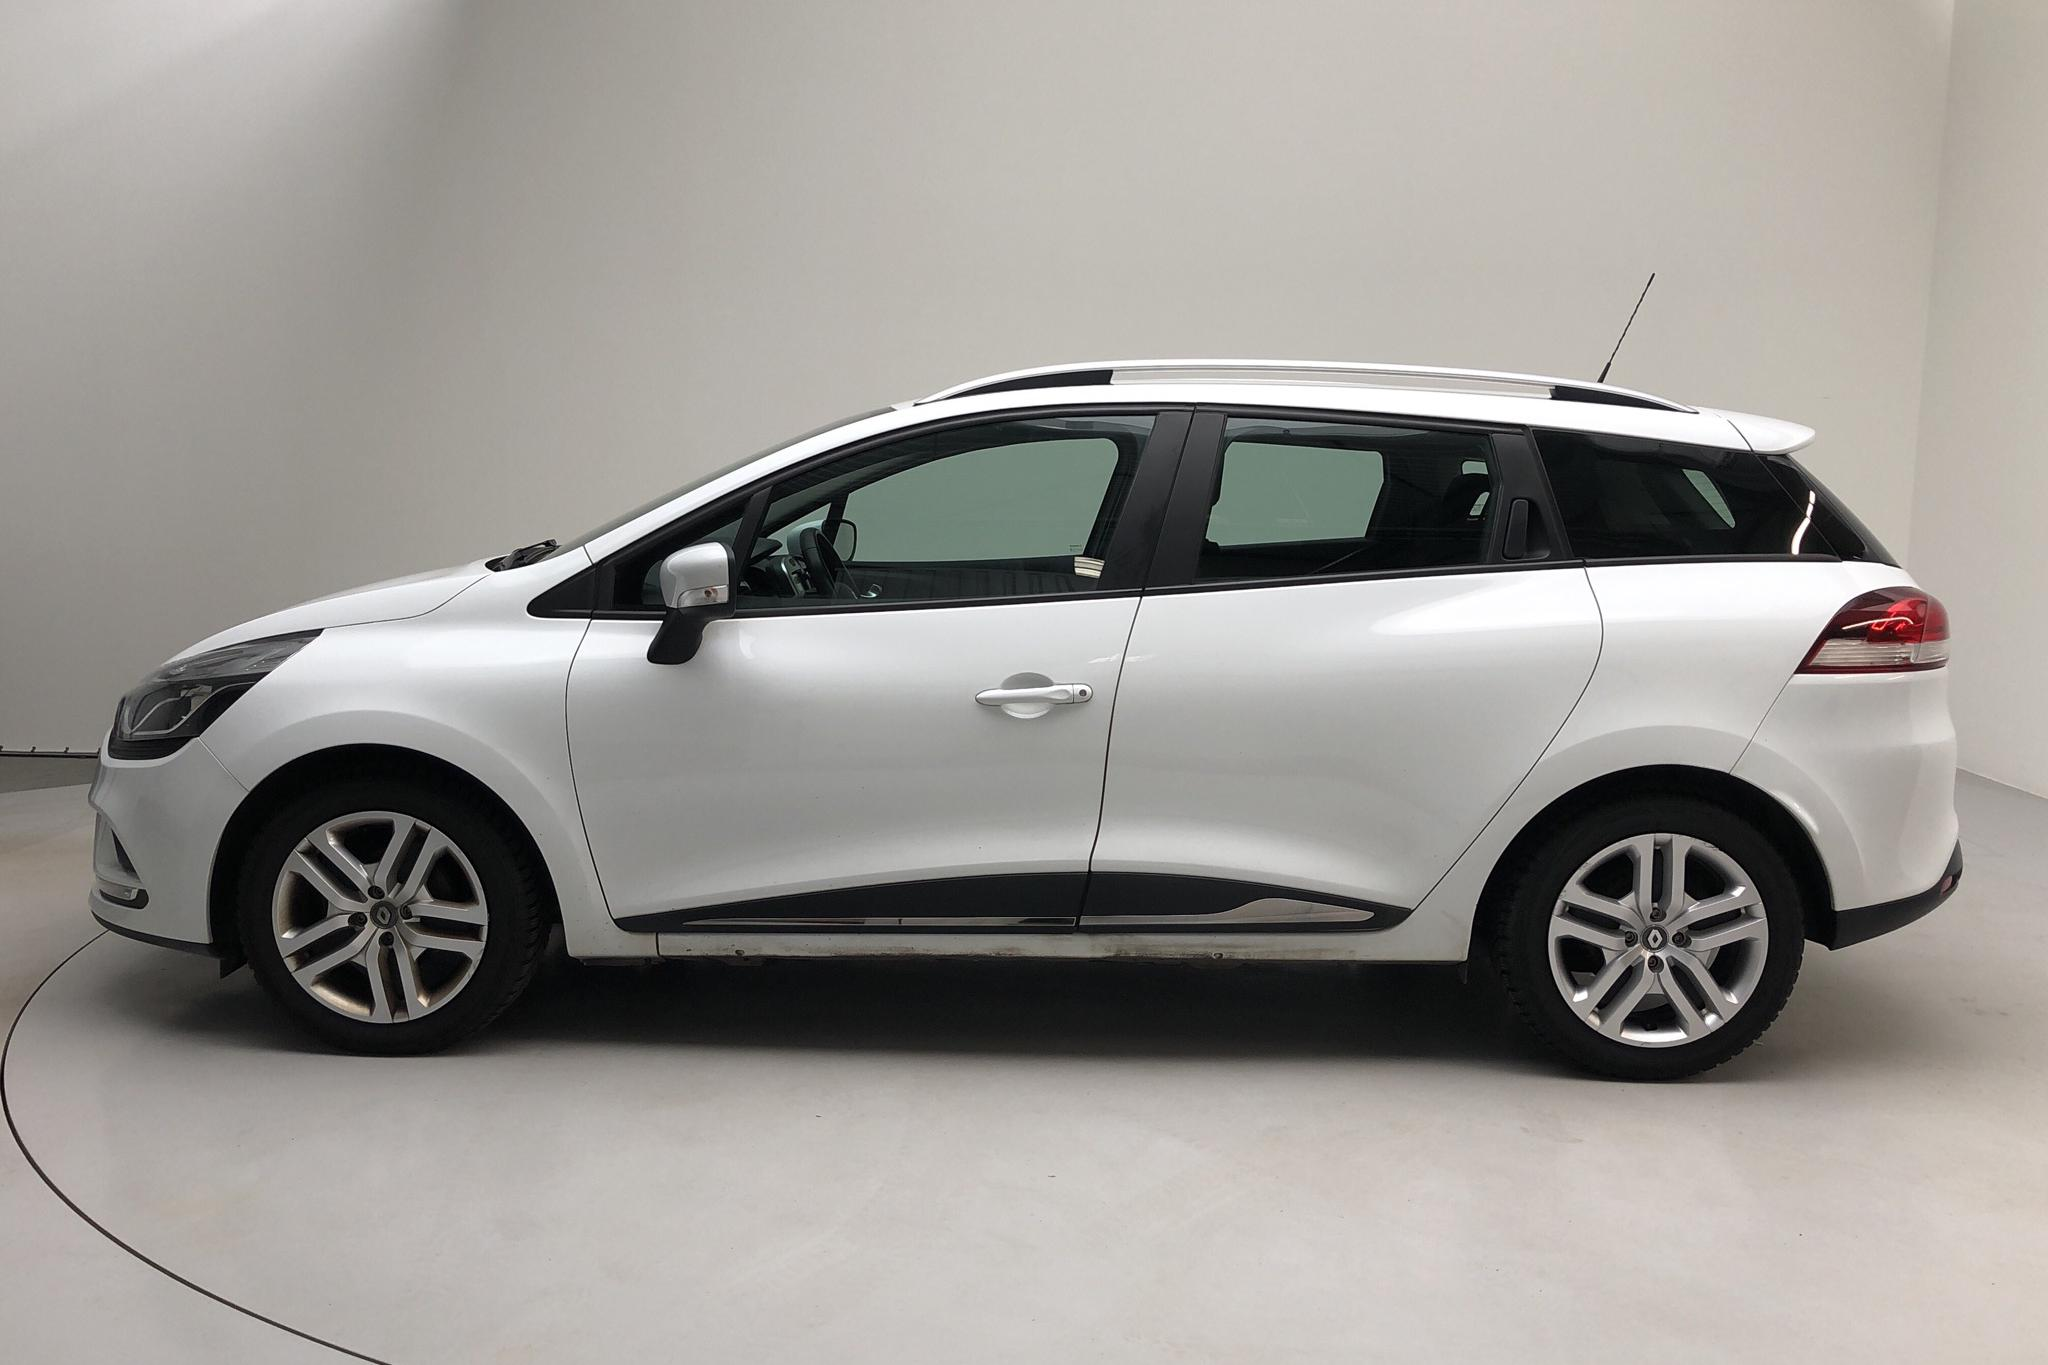 Renault Clio IV 1.2 16V Sports Tourer (75hk) - 47 300 km - Manual - white - 2016